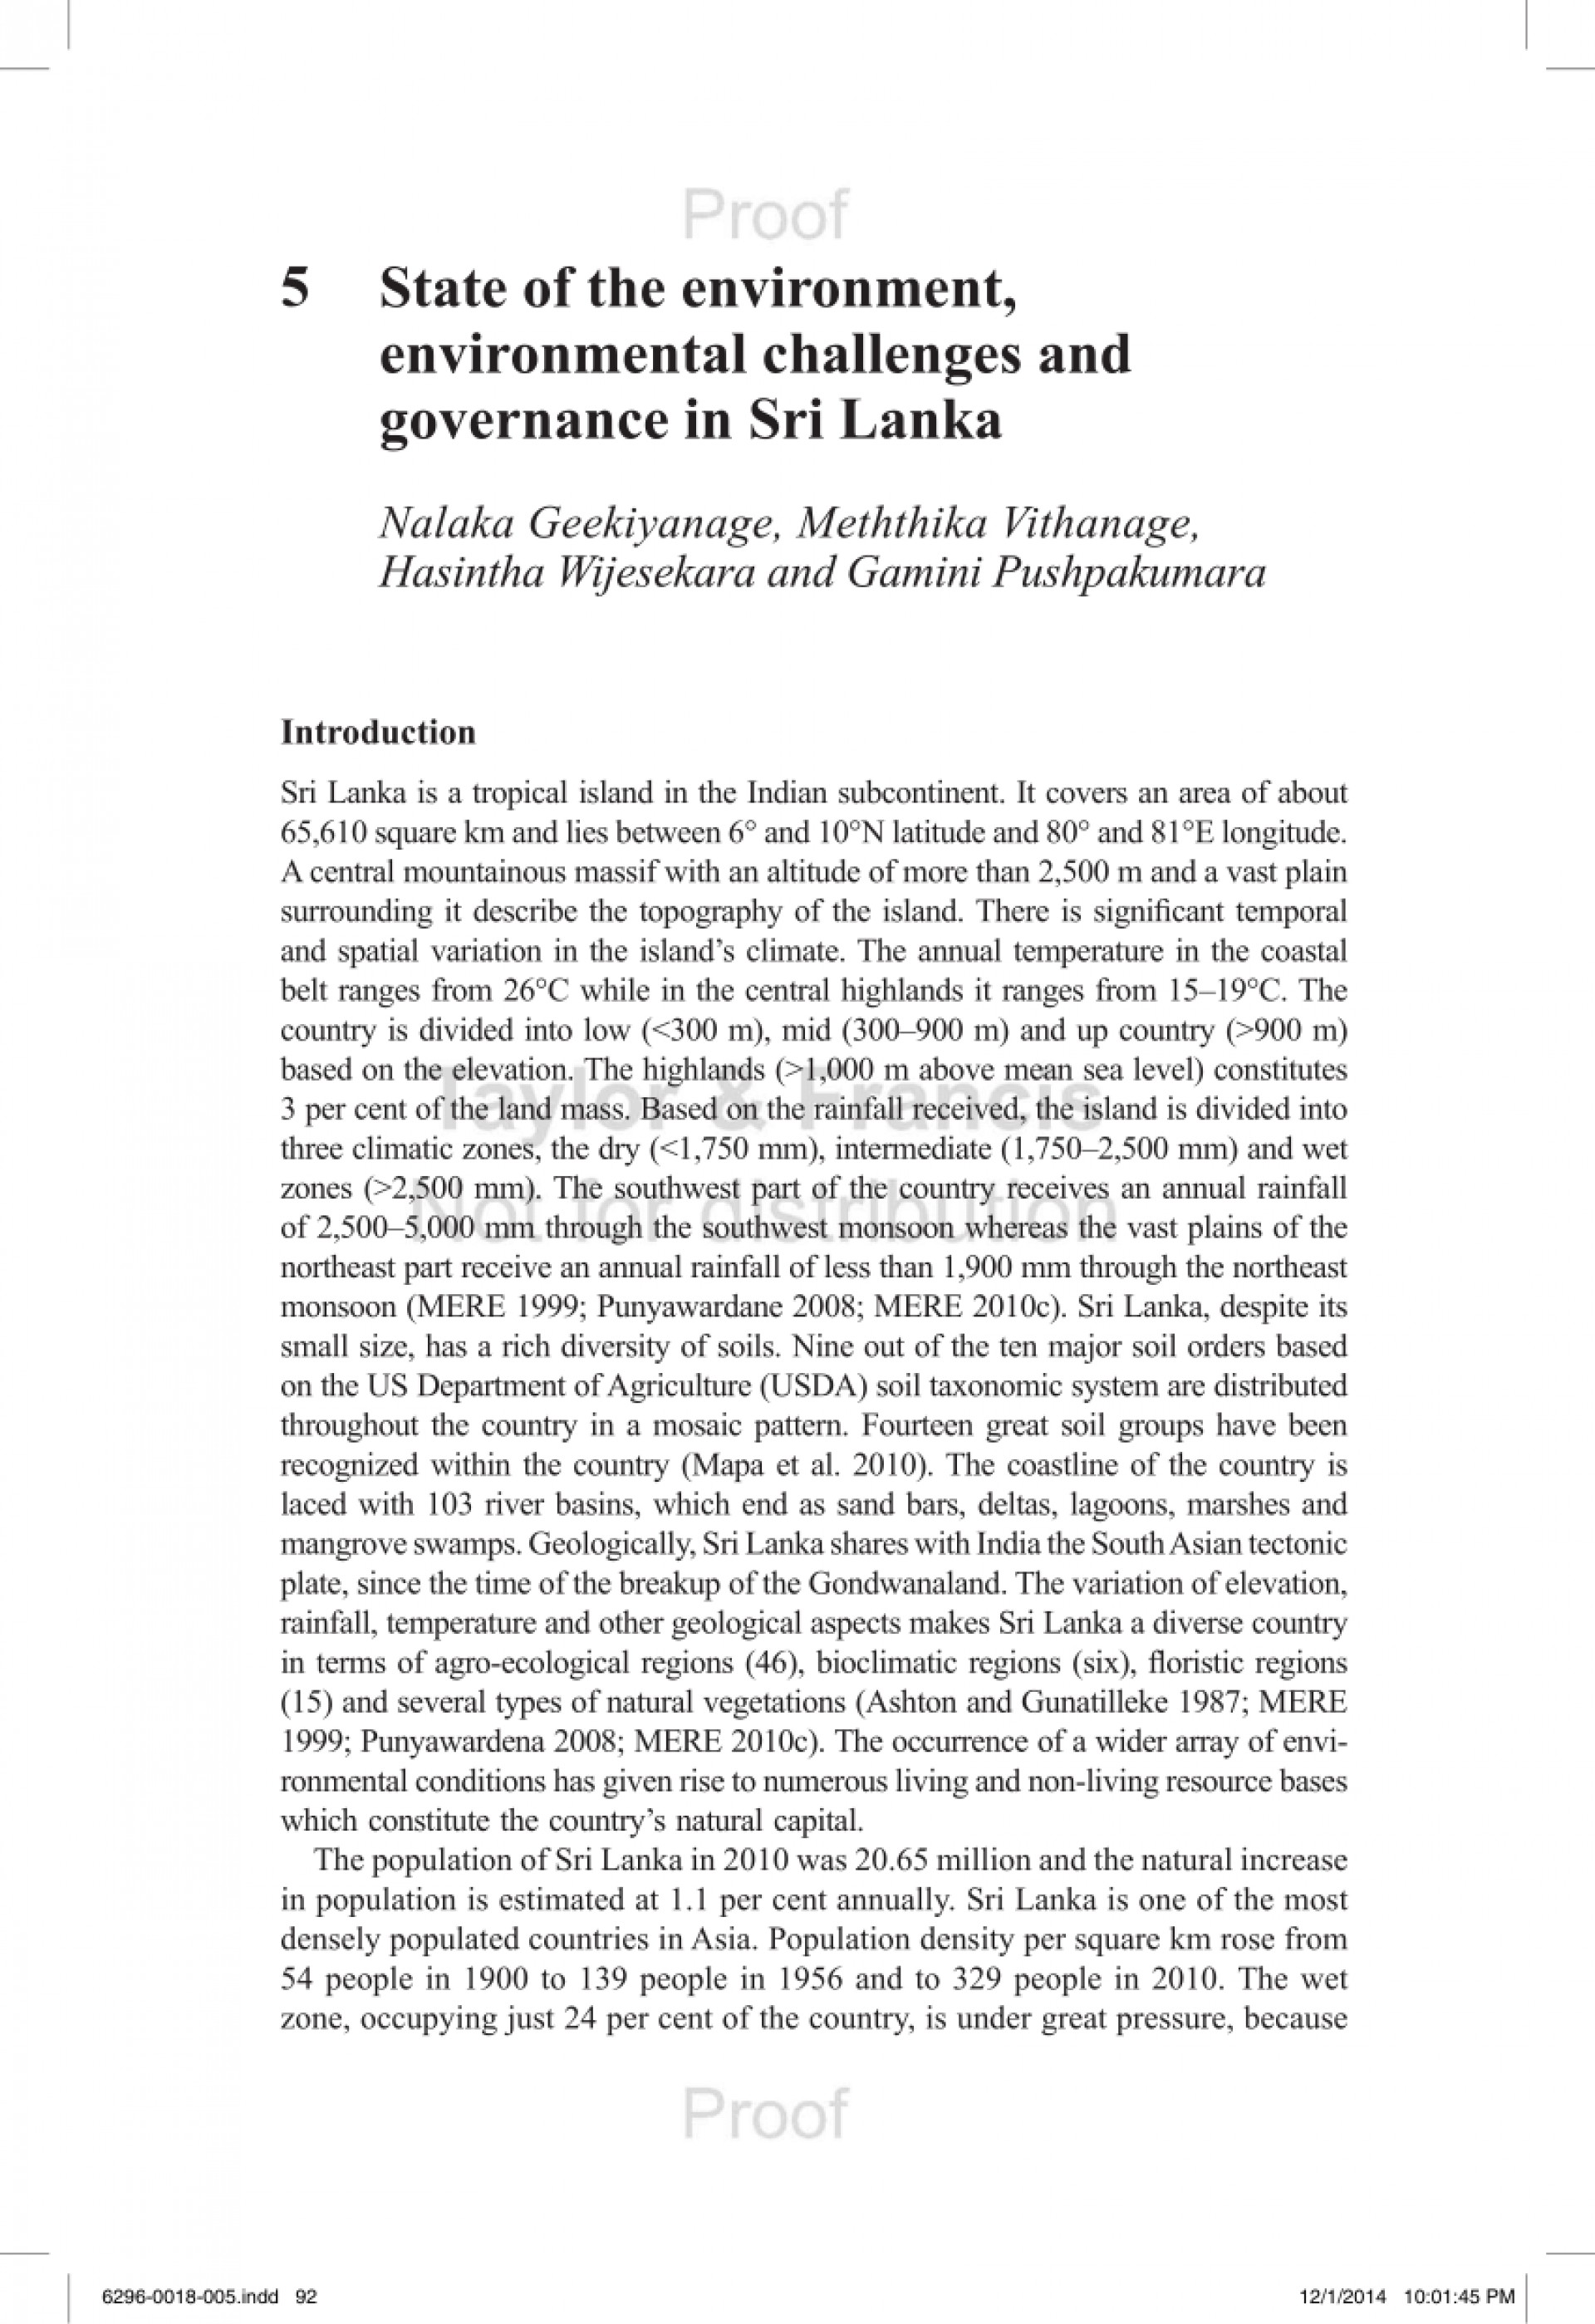 011 Natural Resources In Sri Lanka Essay Example Fantastic 1920